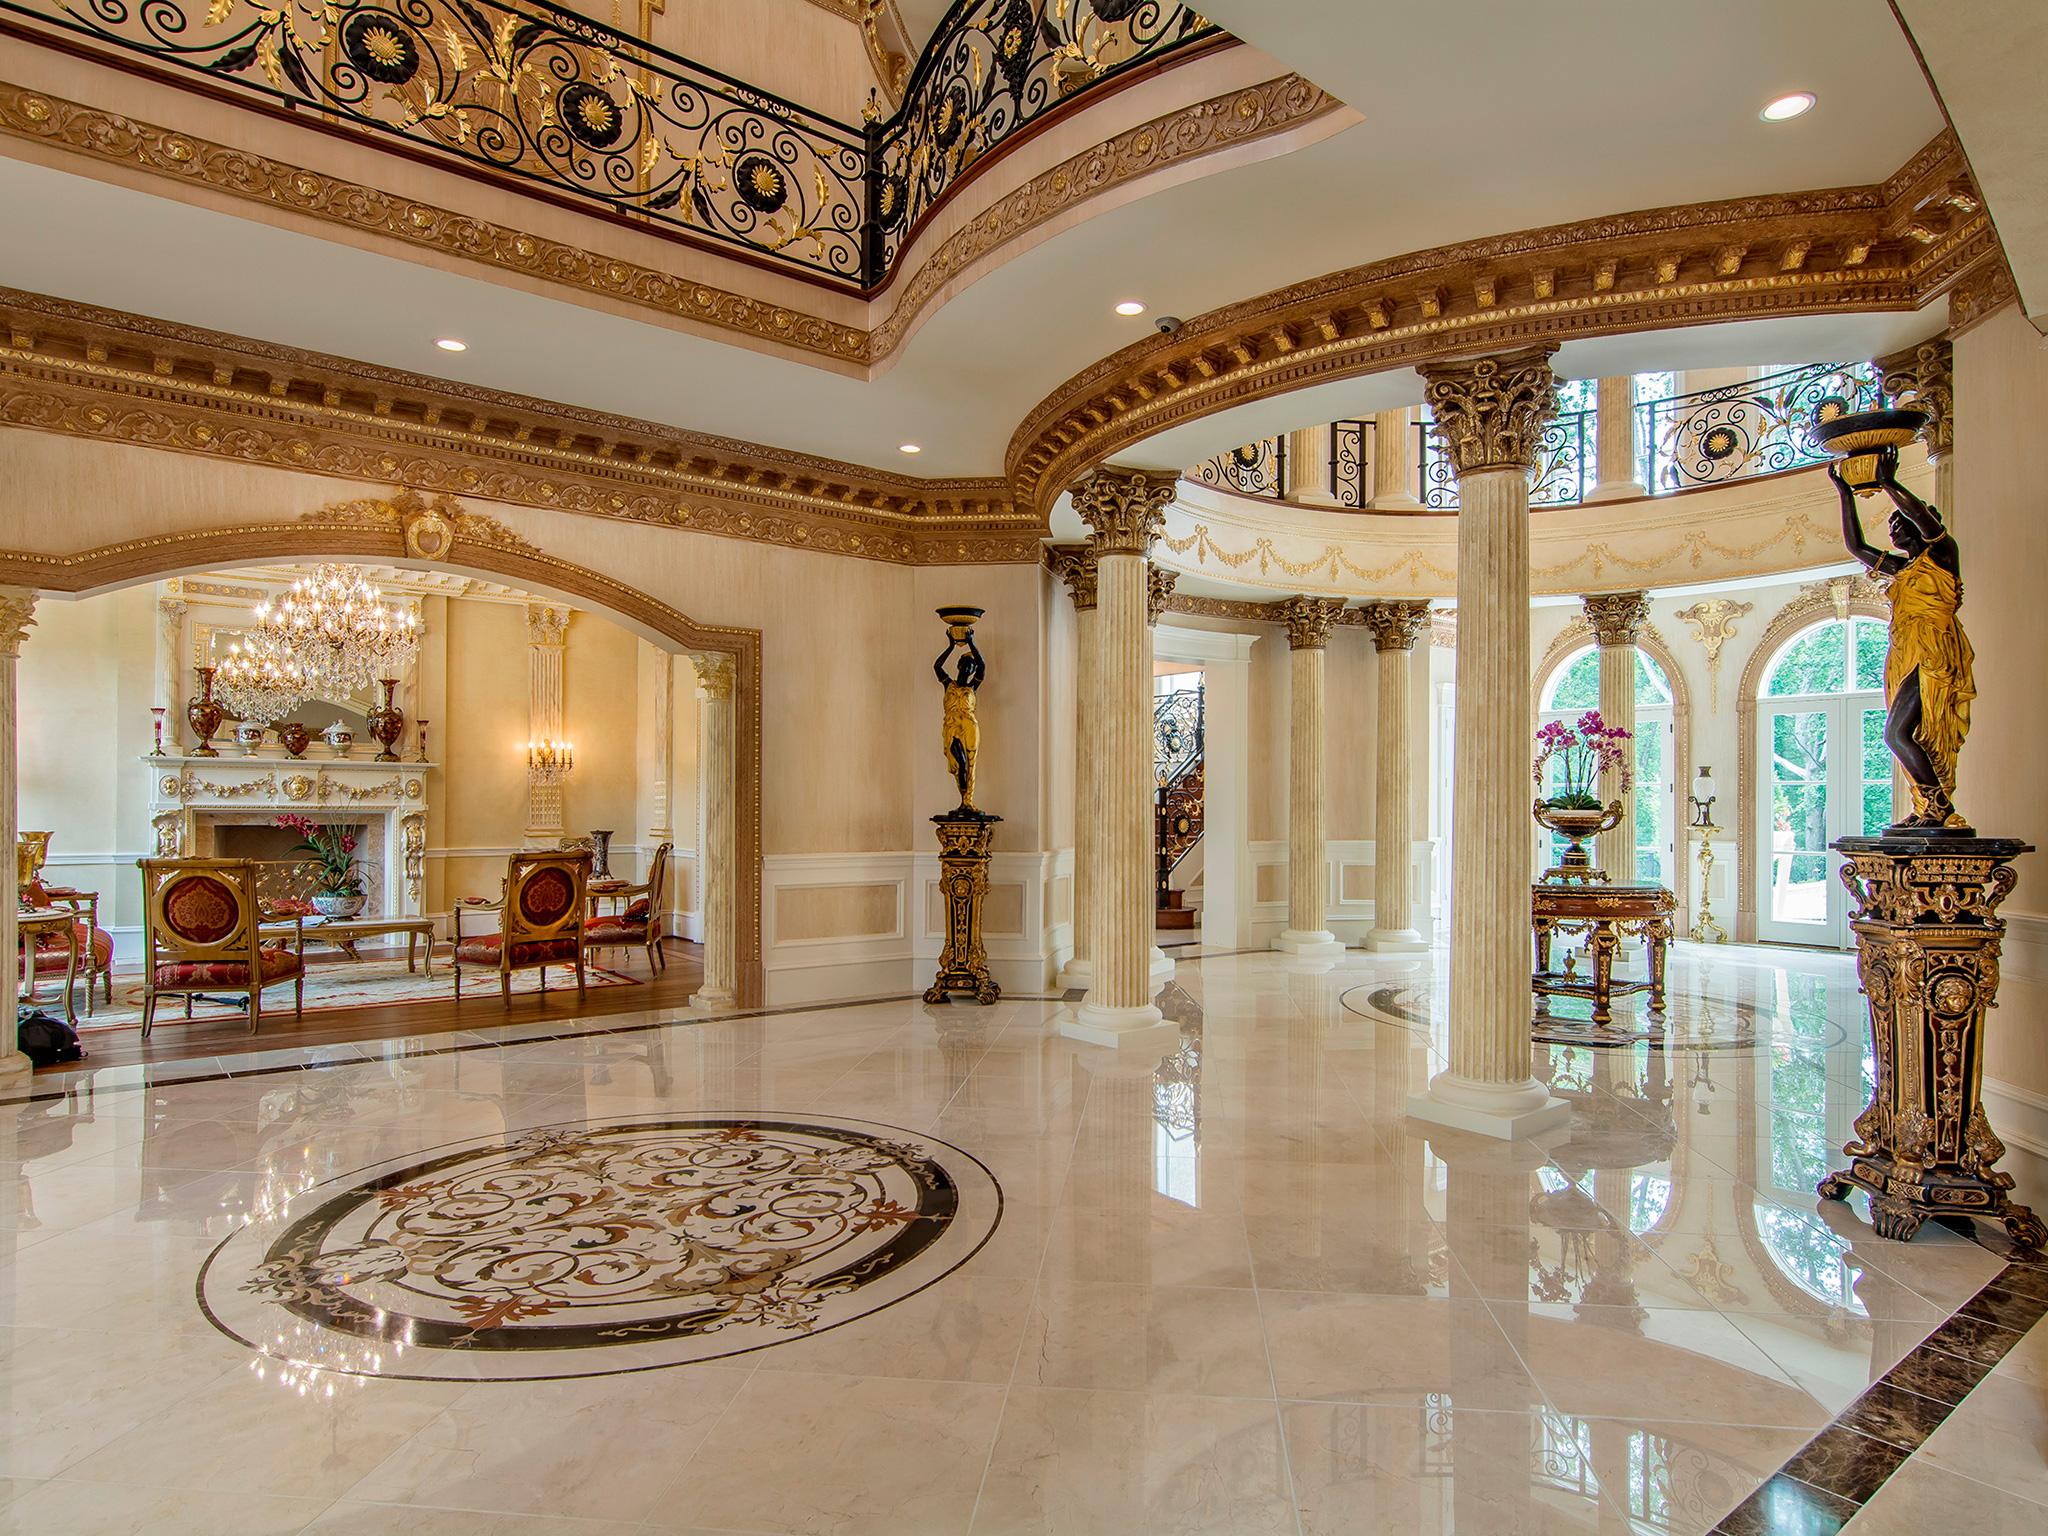 Exquisite Entry Foyer